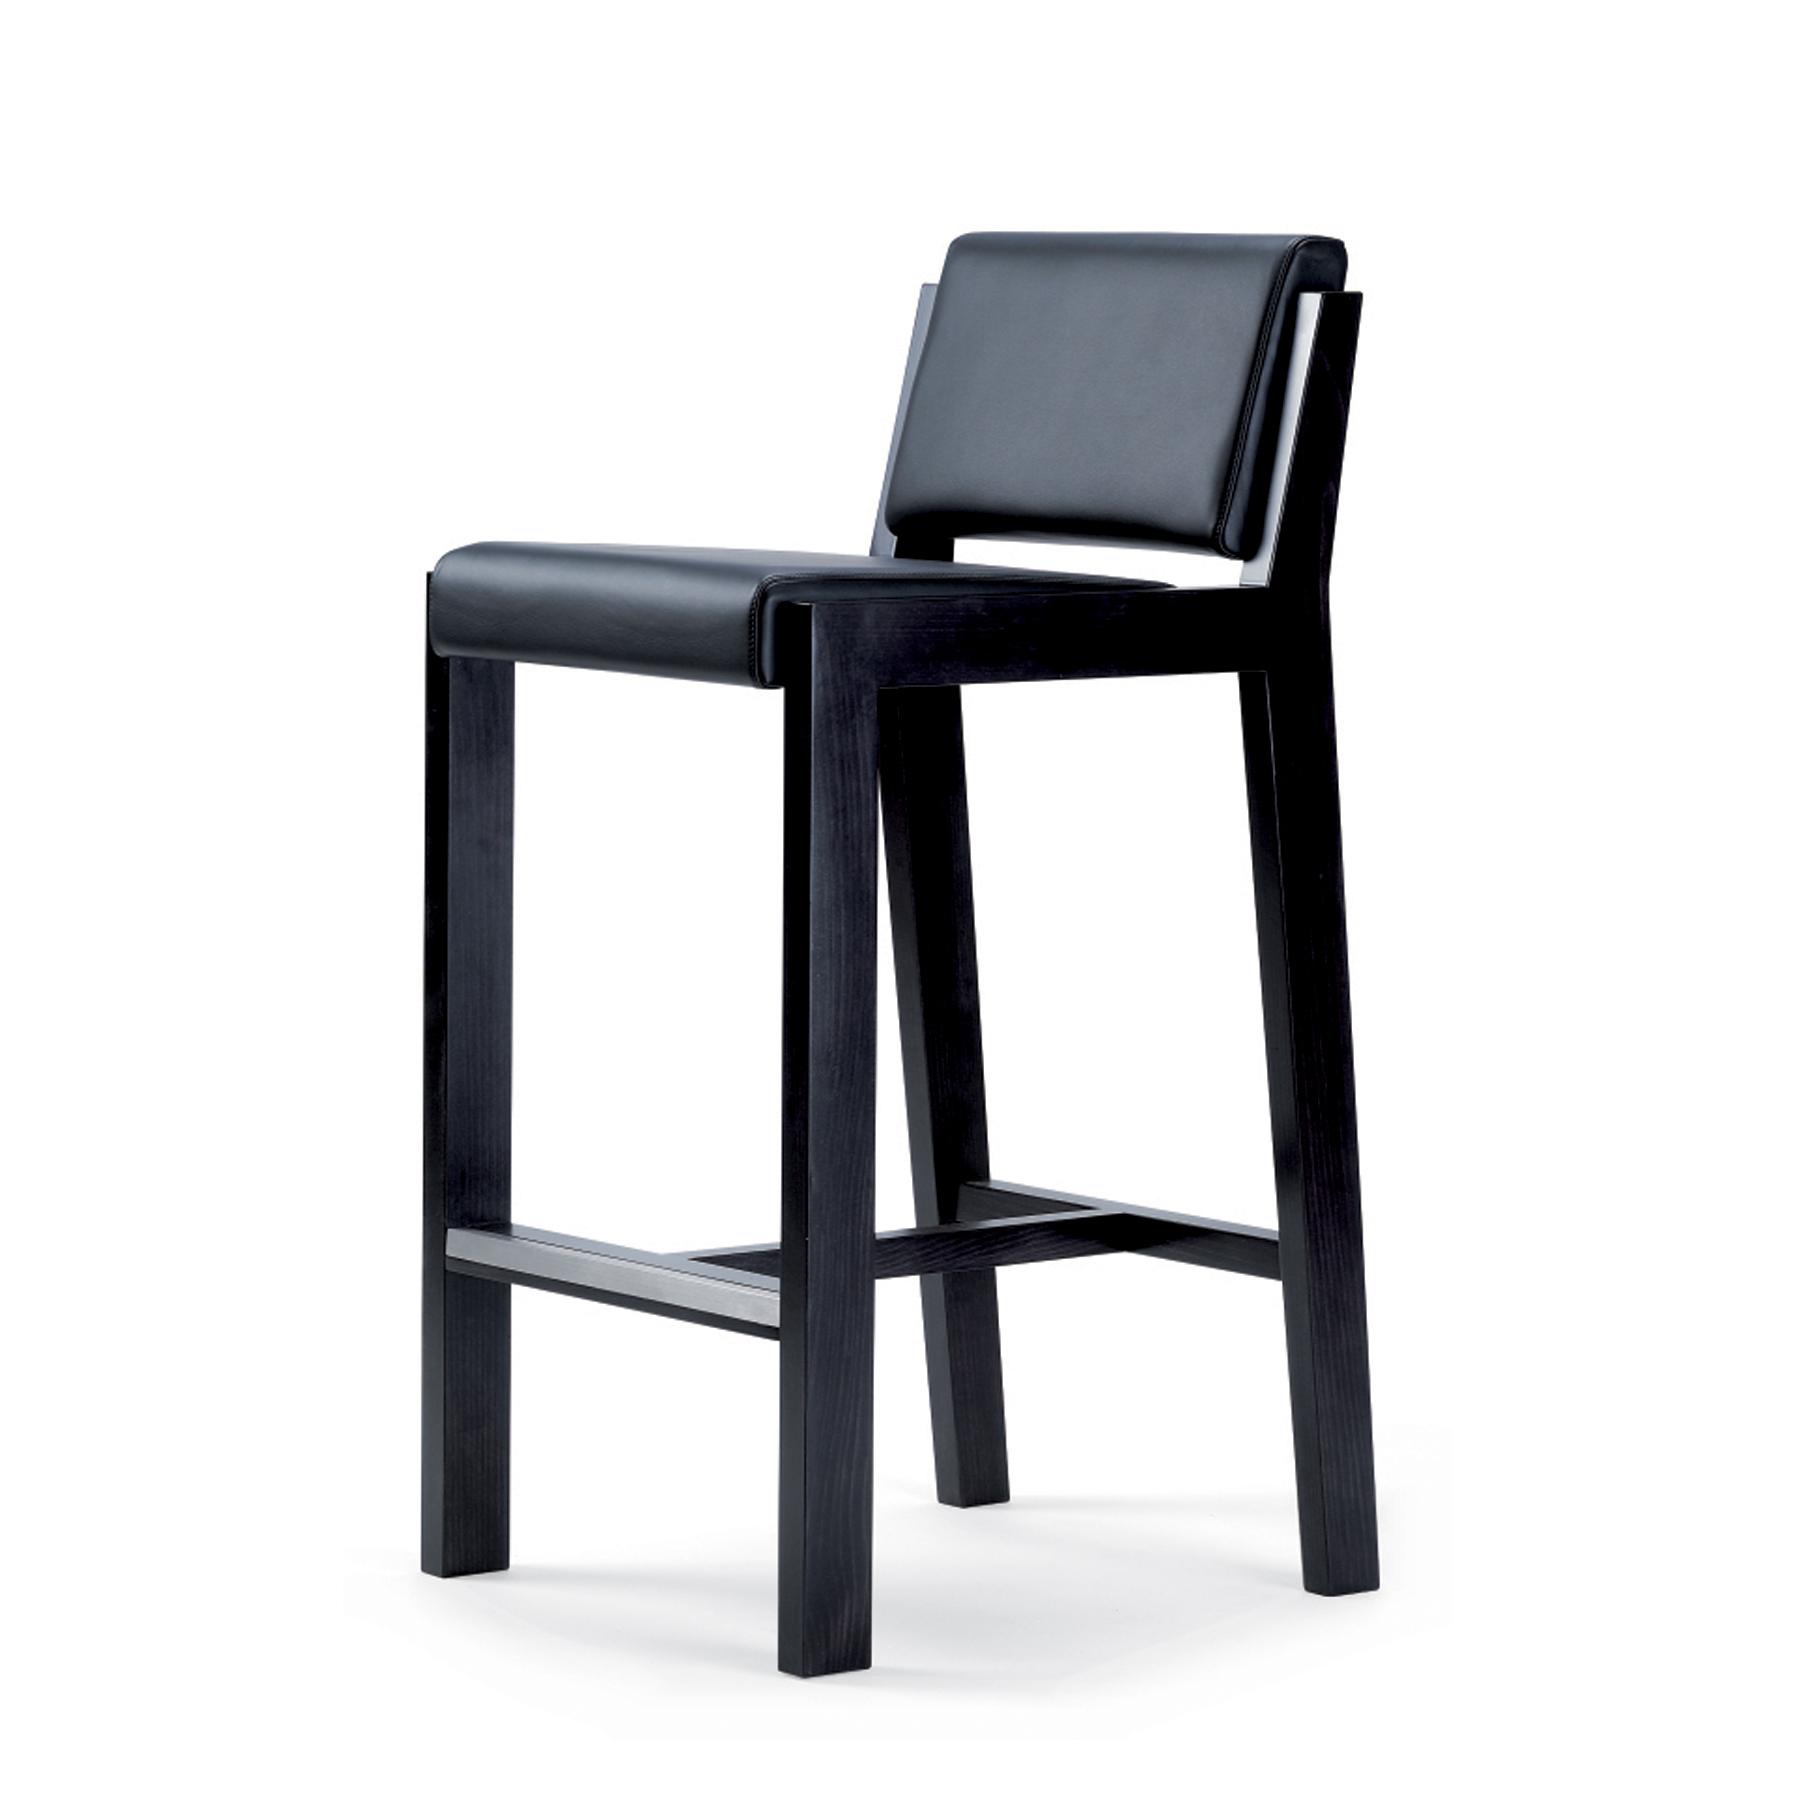 Product-Design-Poltrona-Frau-Kos-2